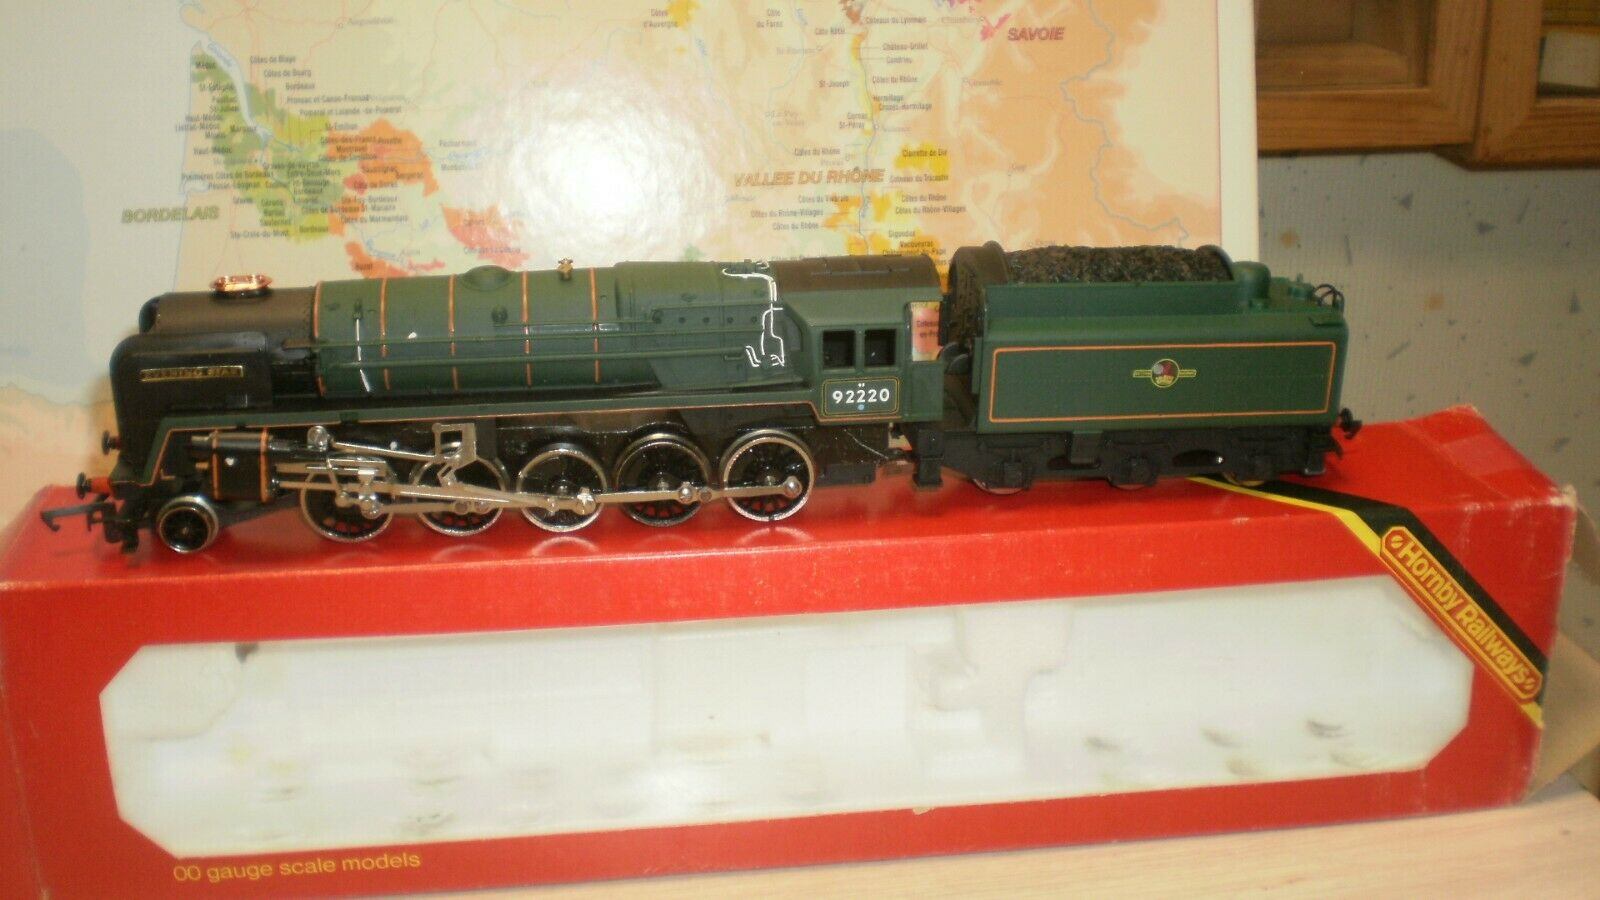 Loco vapeur class 9F   Evening Estrella   92220 BR Hornby Railways voie HO 2rails